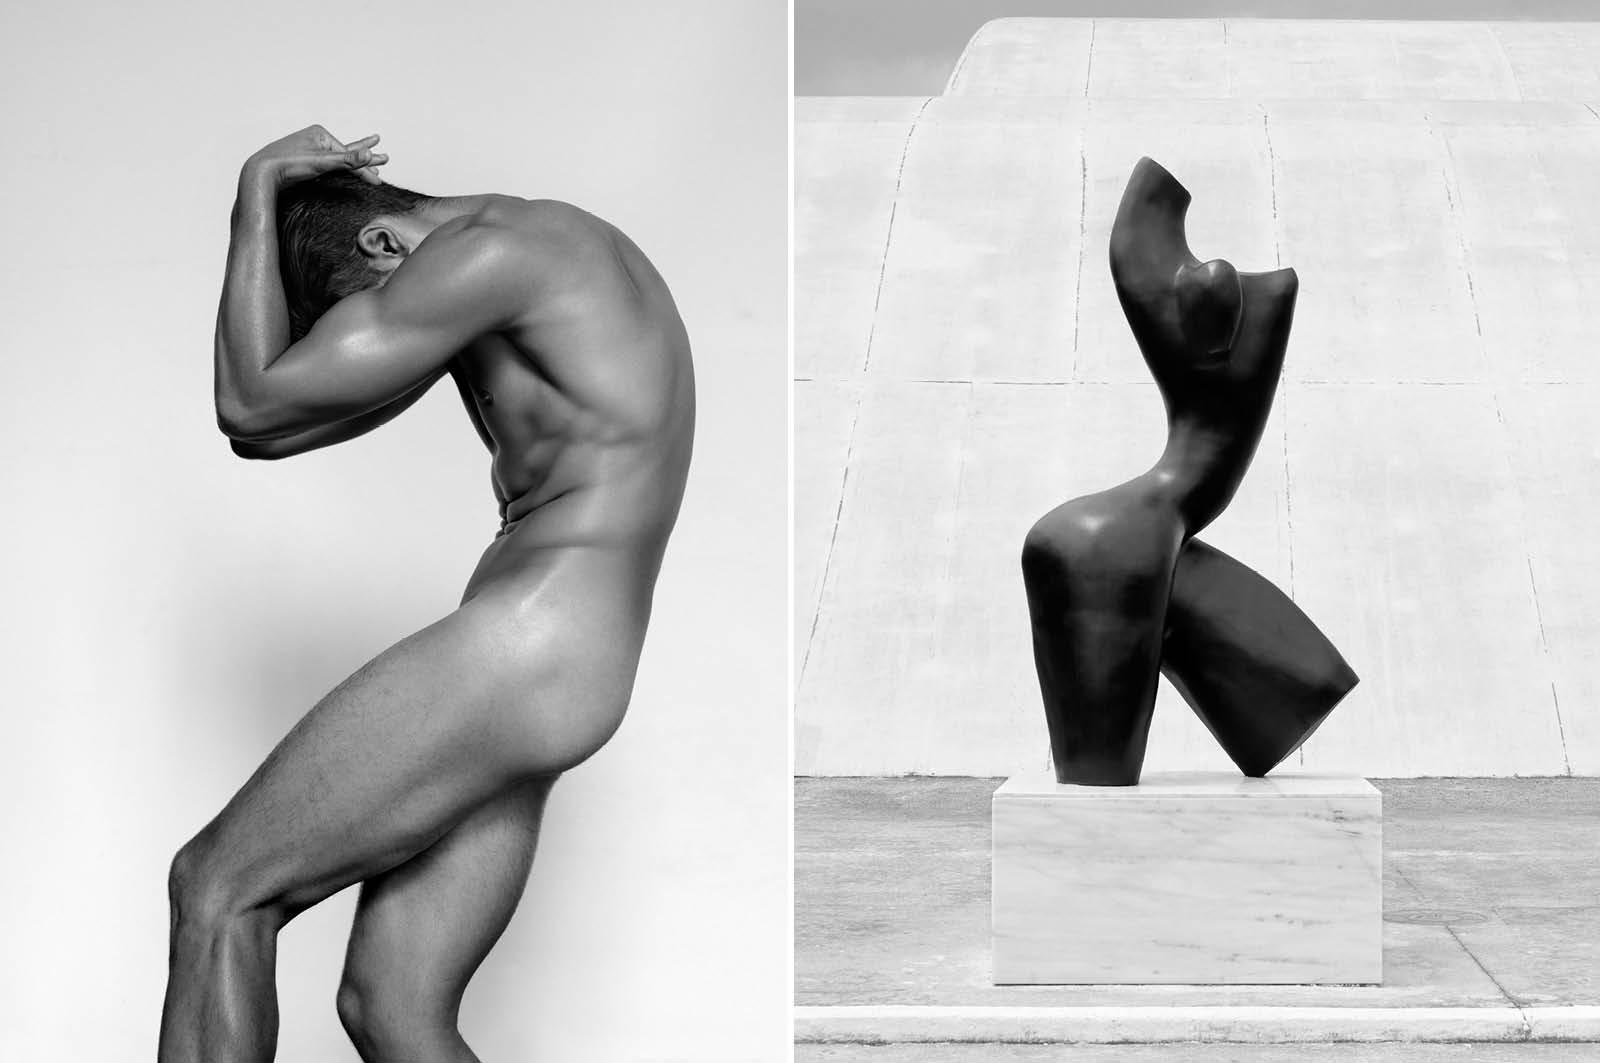 Male Nude (Bent Forward), 2013 / Black Torso, São Paulo, 2011